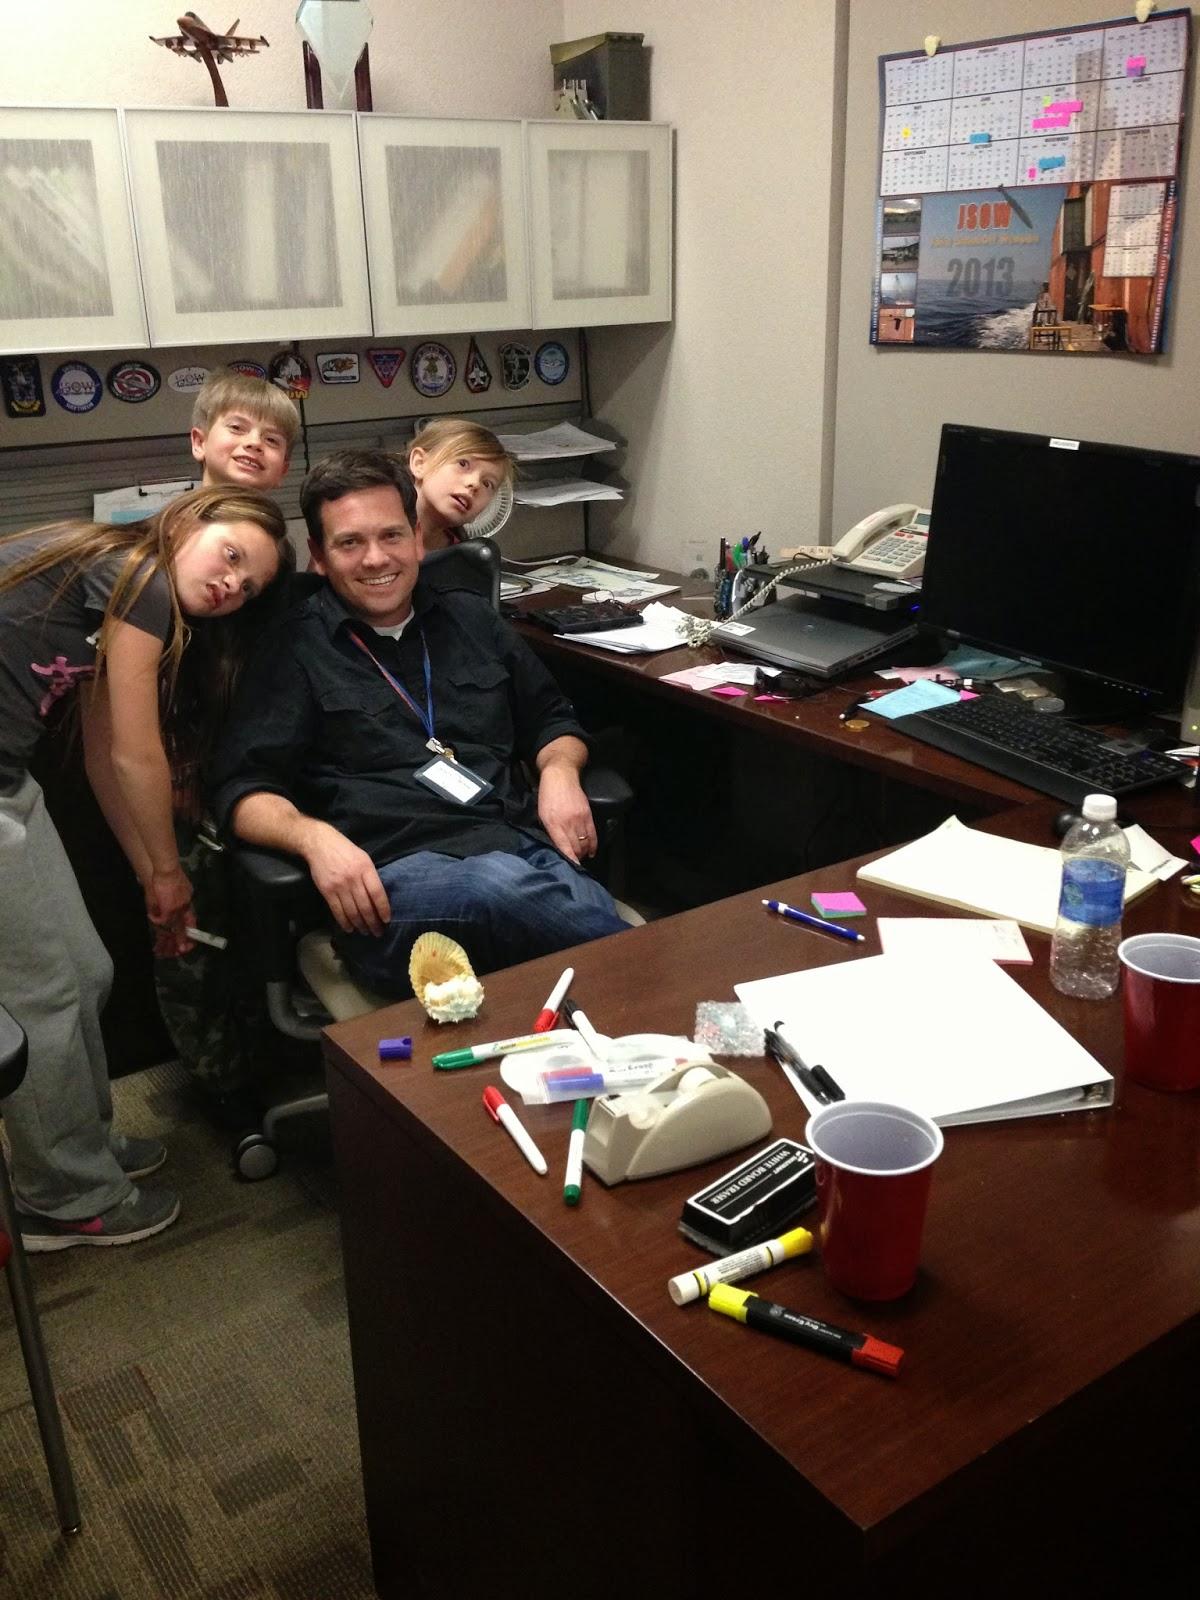 family, office